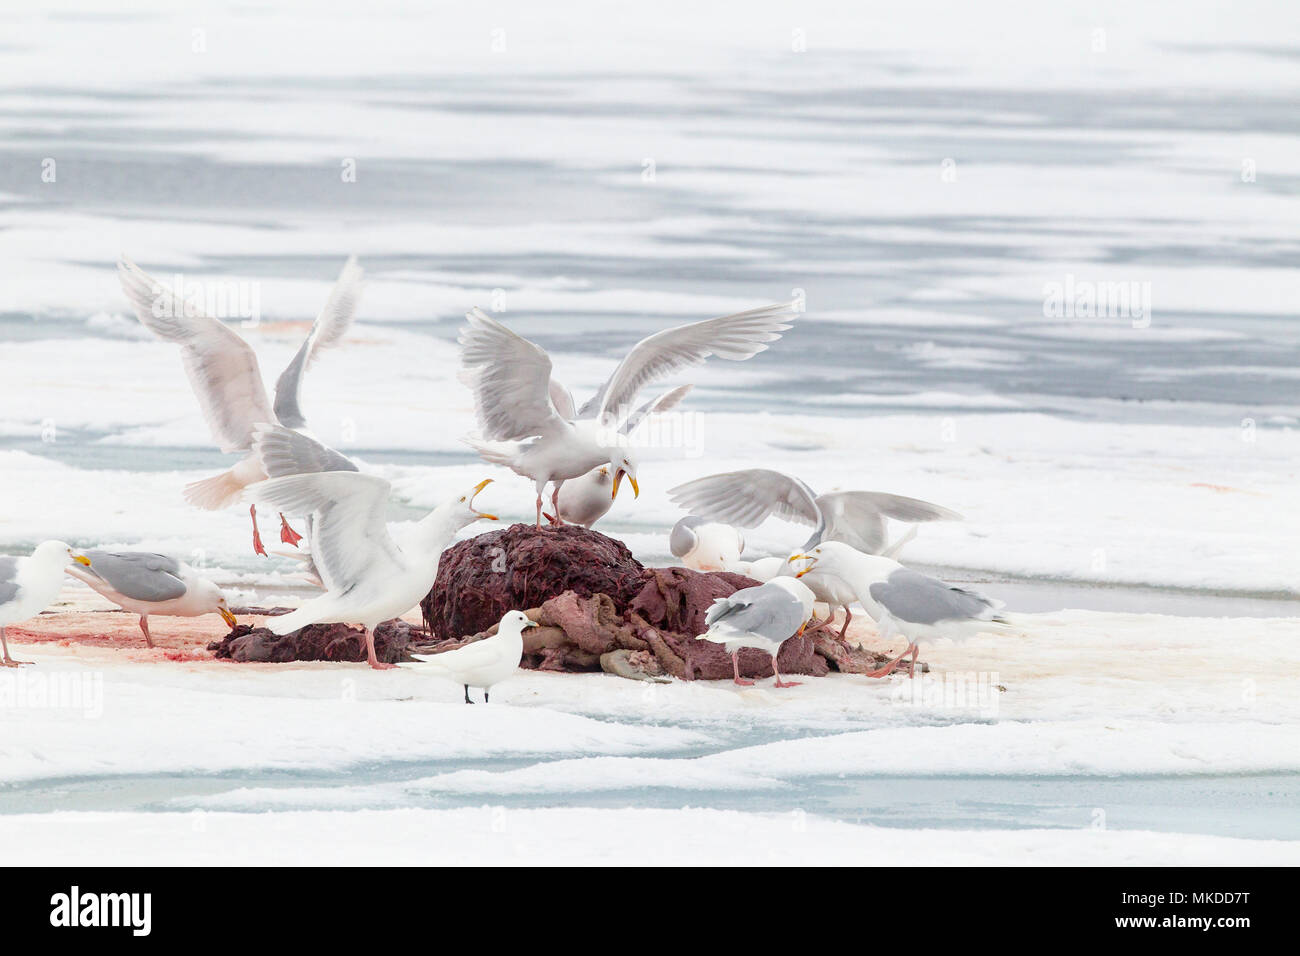 Glaucus gulls (Larus hyperboreus) eating the remain of a walrus (Odobenus rosmarus), on the ice, when polar bear (Ursus maritimus) has finish to eat. Spitsbergen, Svalbard, Norwegian archipelago, Norway, Arctic Ocean - Stock Image